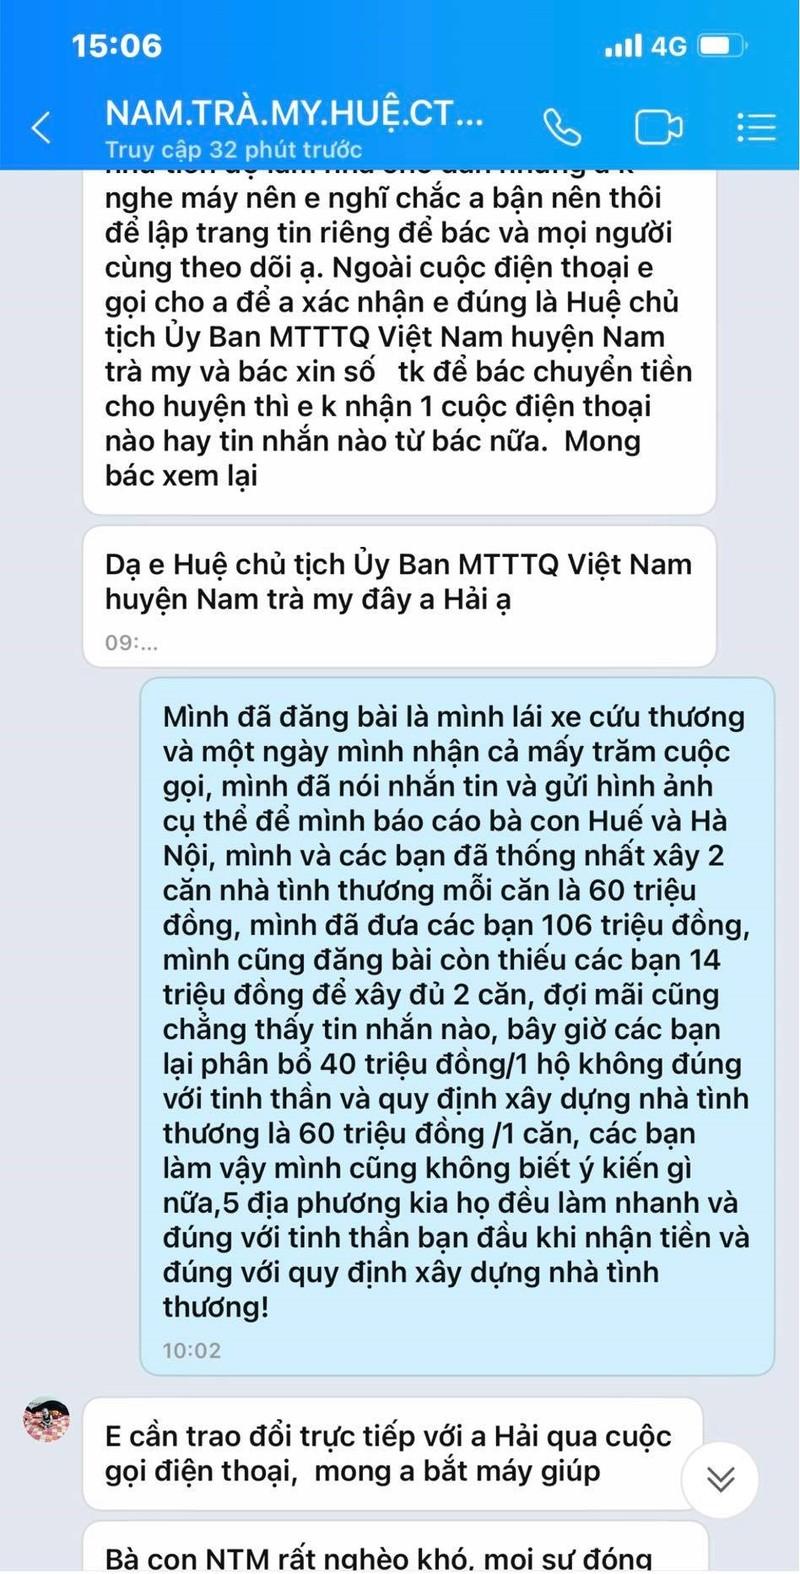 Doi lai 106 trieu dong ho tro nguoi ngheo: Ong Doan Ngoc Hai noi gi?-Hinh-2